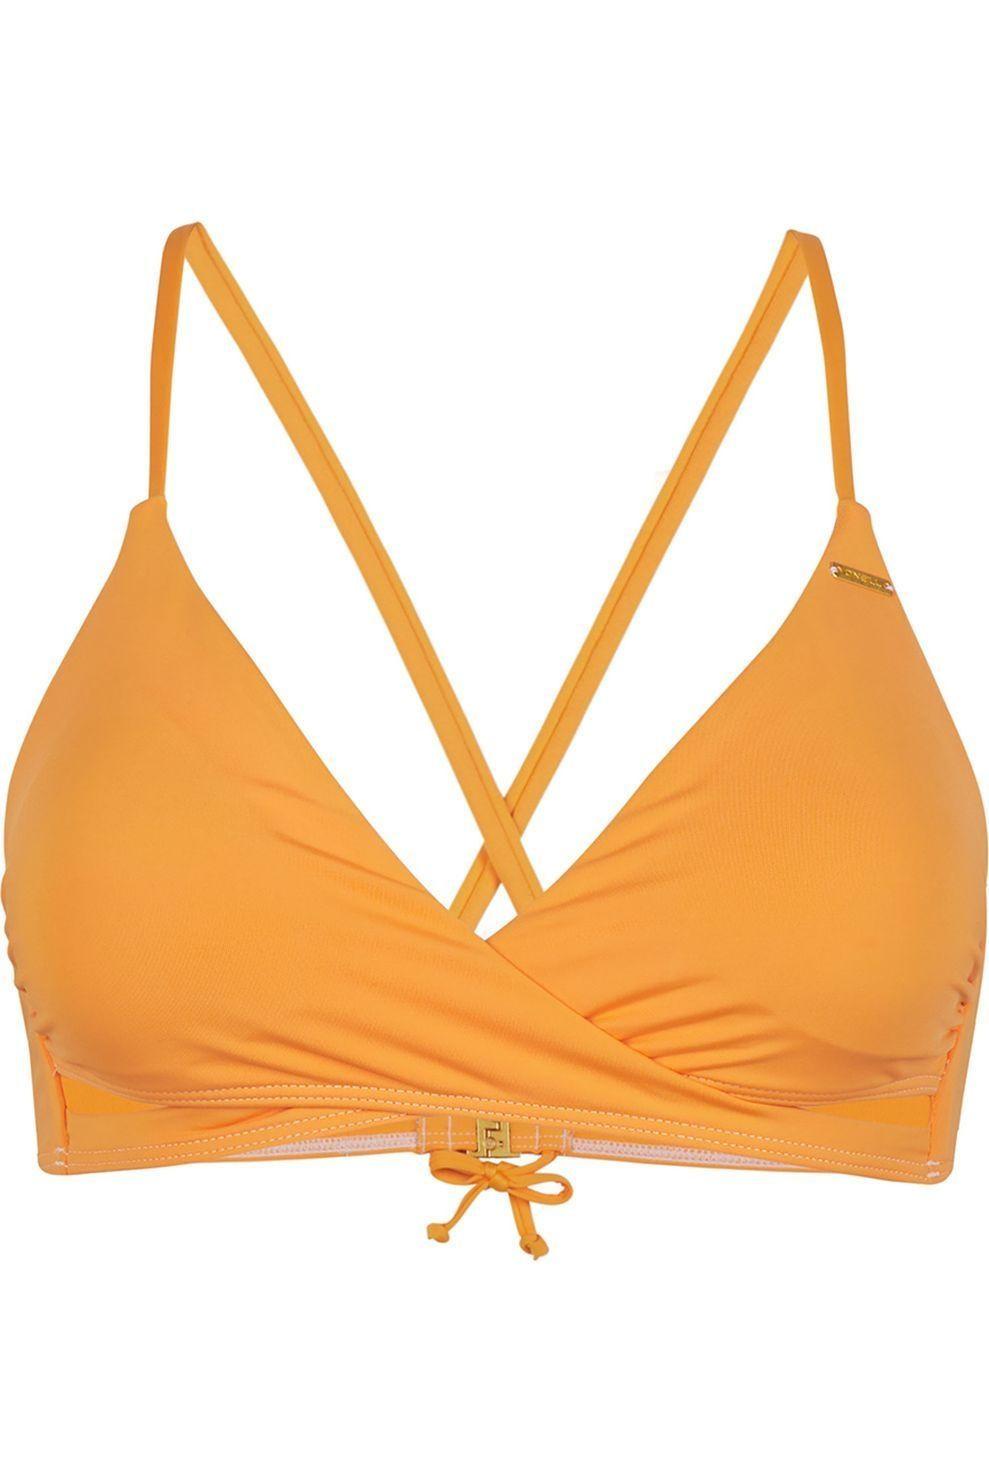 O'Neill Bh Pw Baay voor dames - Oranje - Maten: 36, 38, 40